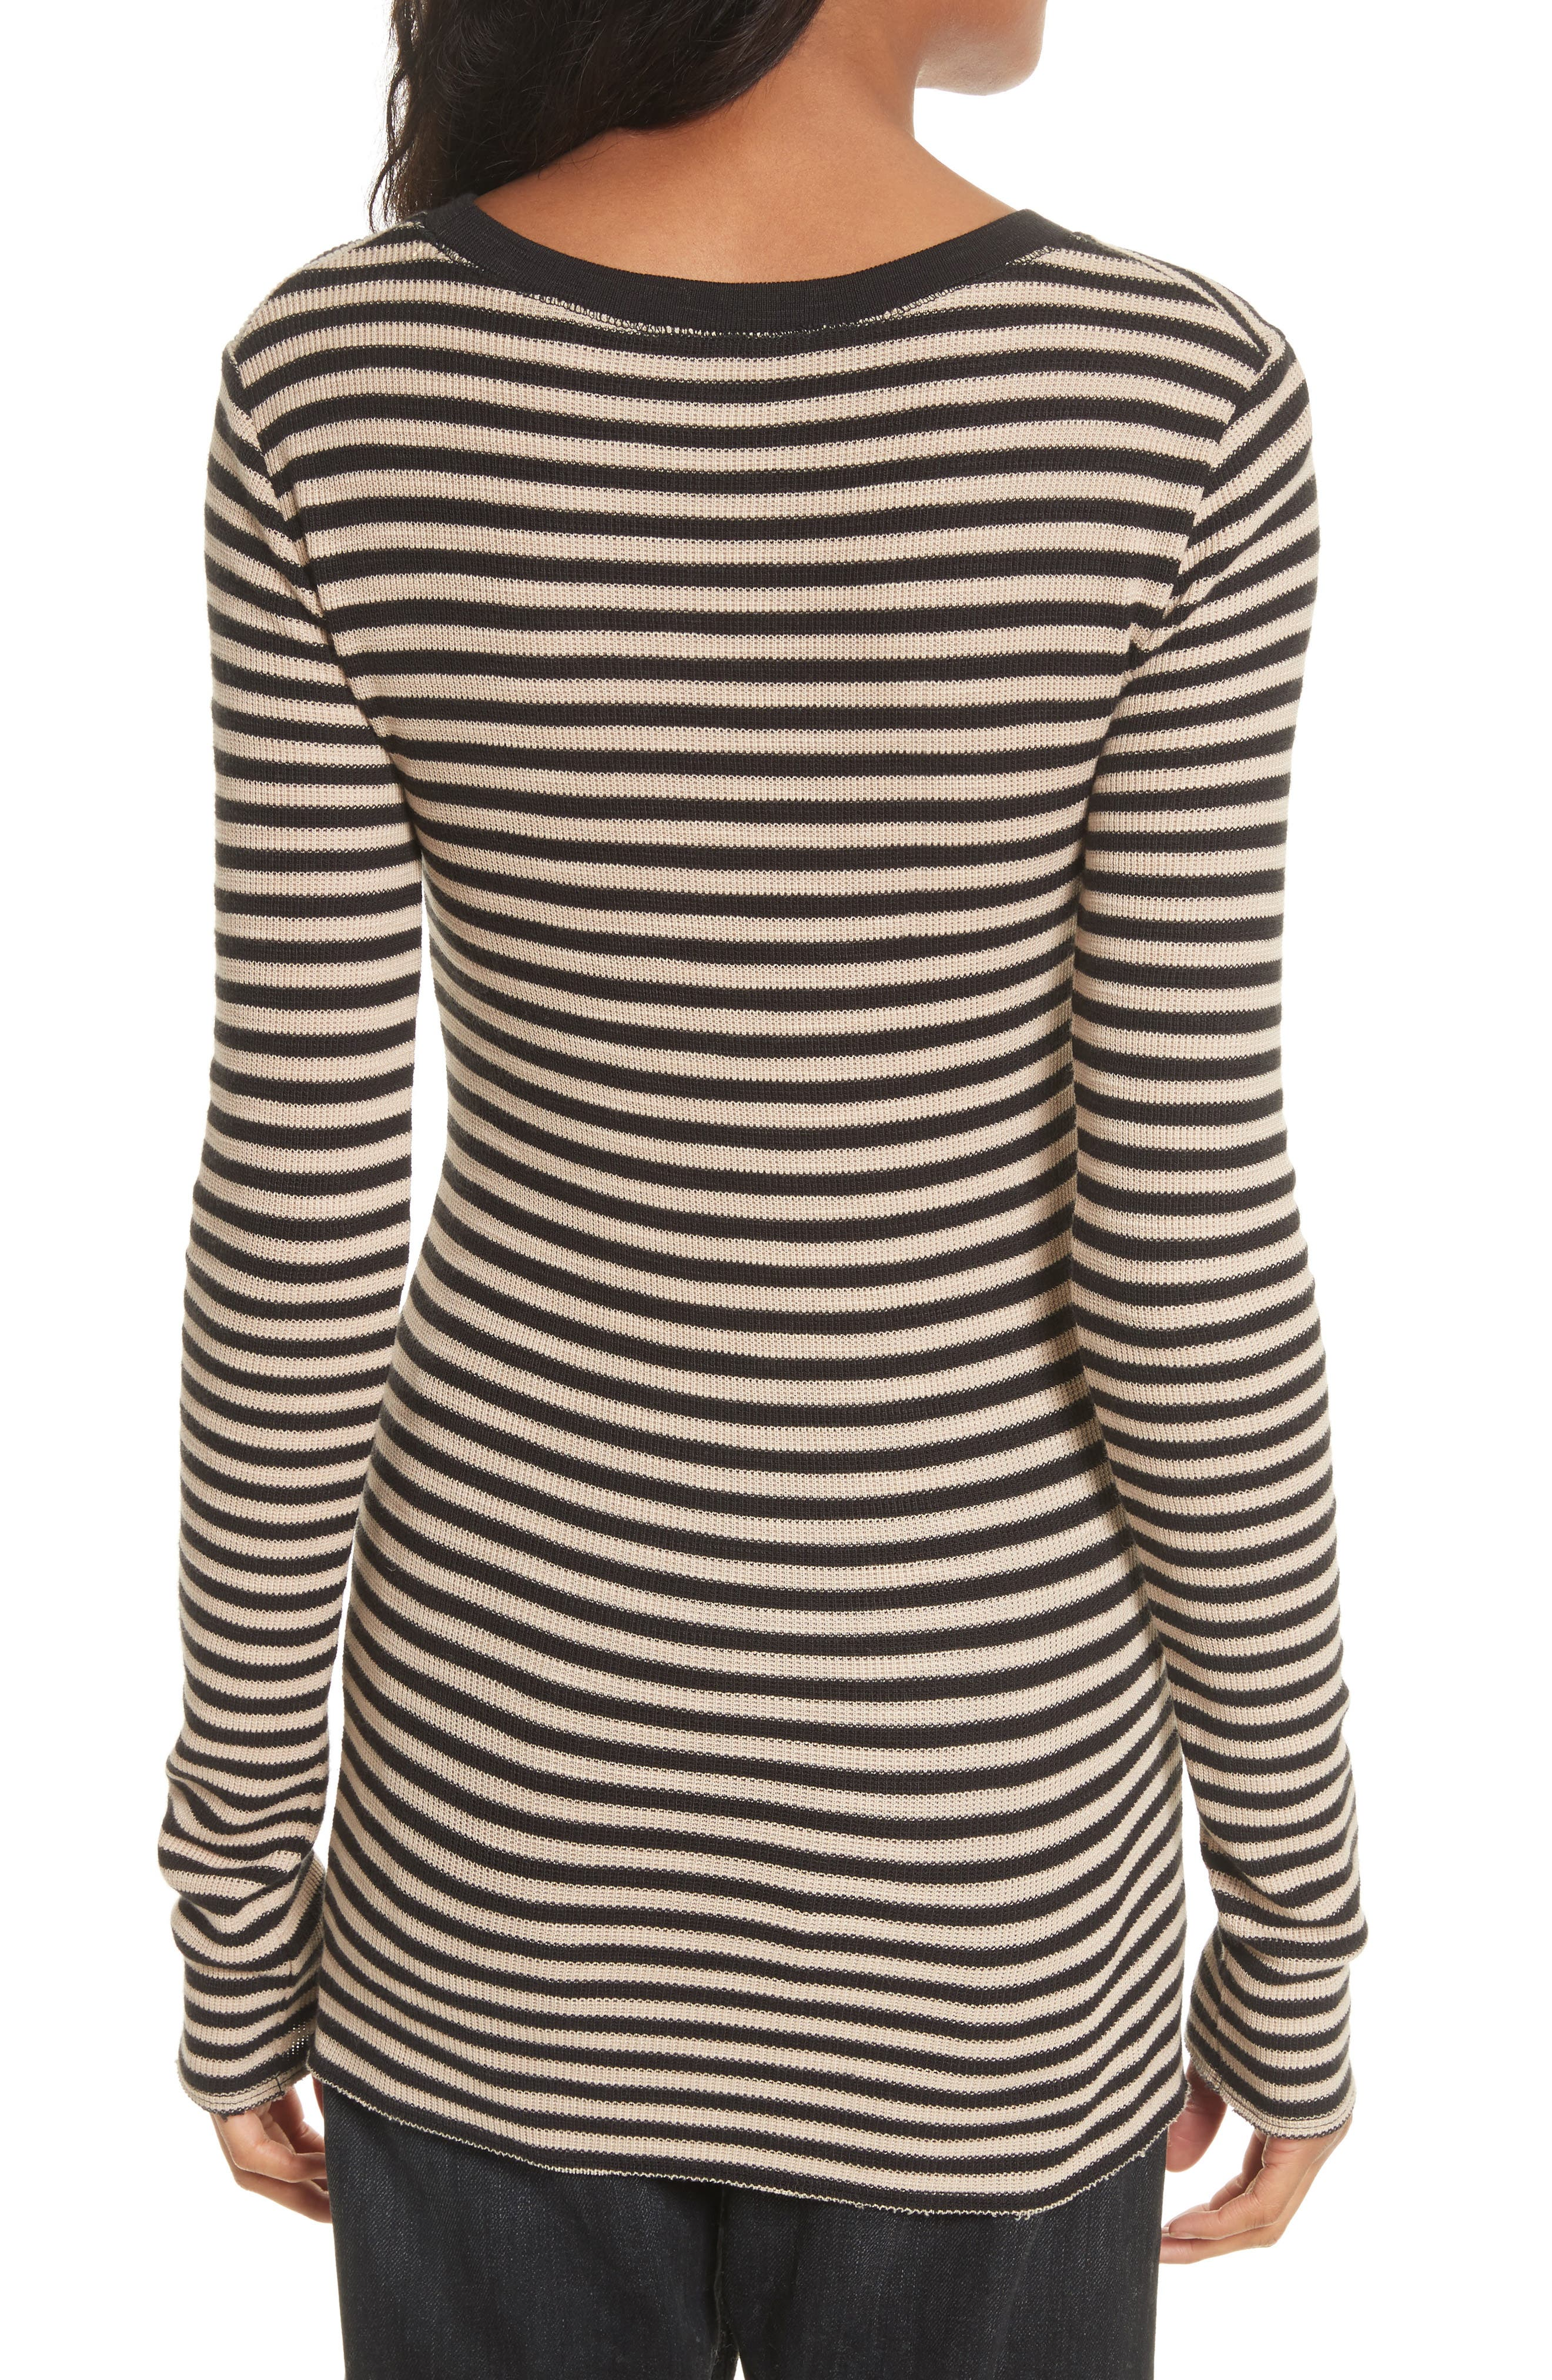 Railroad Stripe Crewneck Sweater,                             Alternate thumbnail 4, color,                             Taupe/ Black